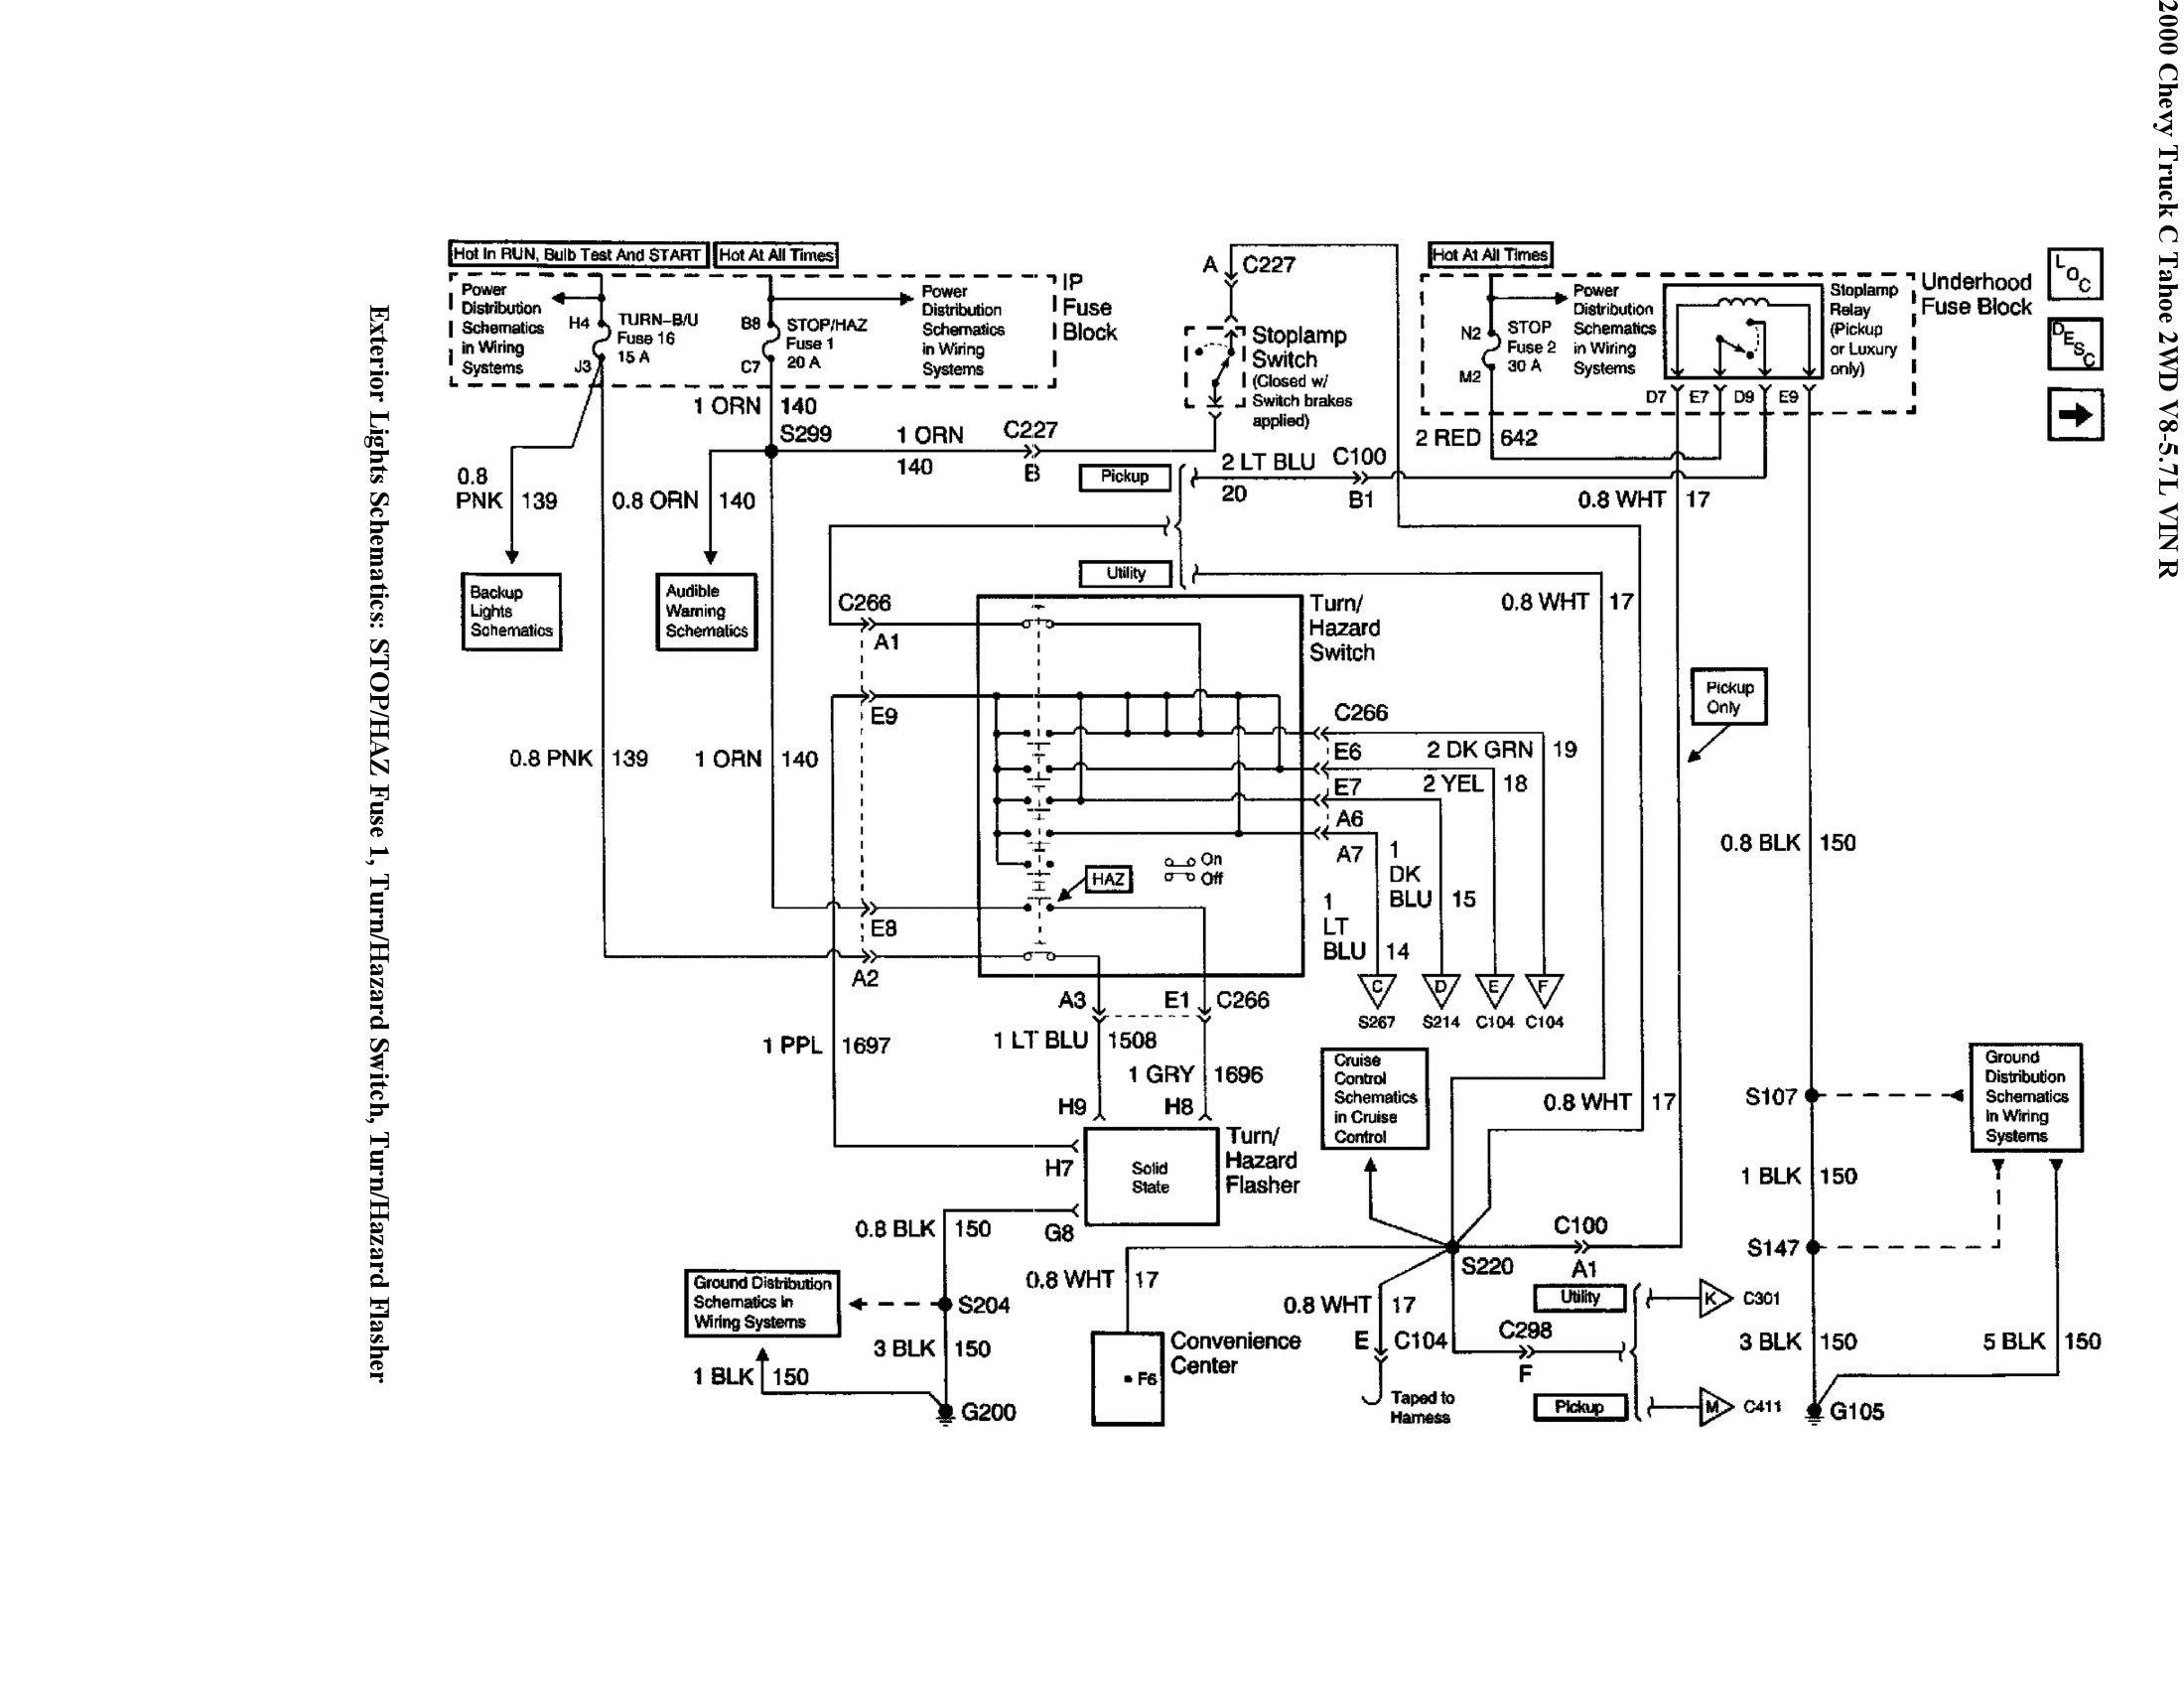 2013 Chevy Silverado Dash Wiring Harness Diagram Wiring Diagram Alternator B Alternator B Sposamiora It